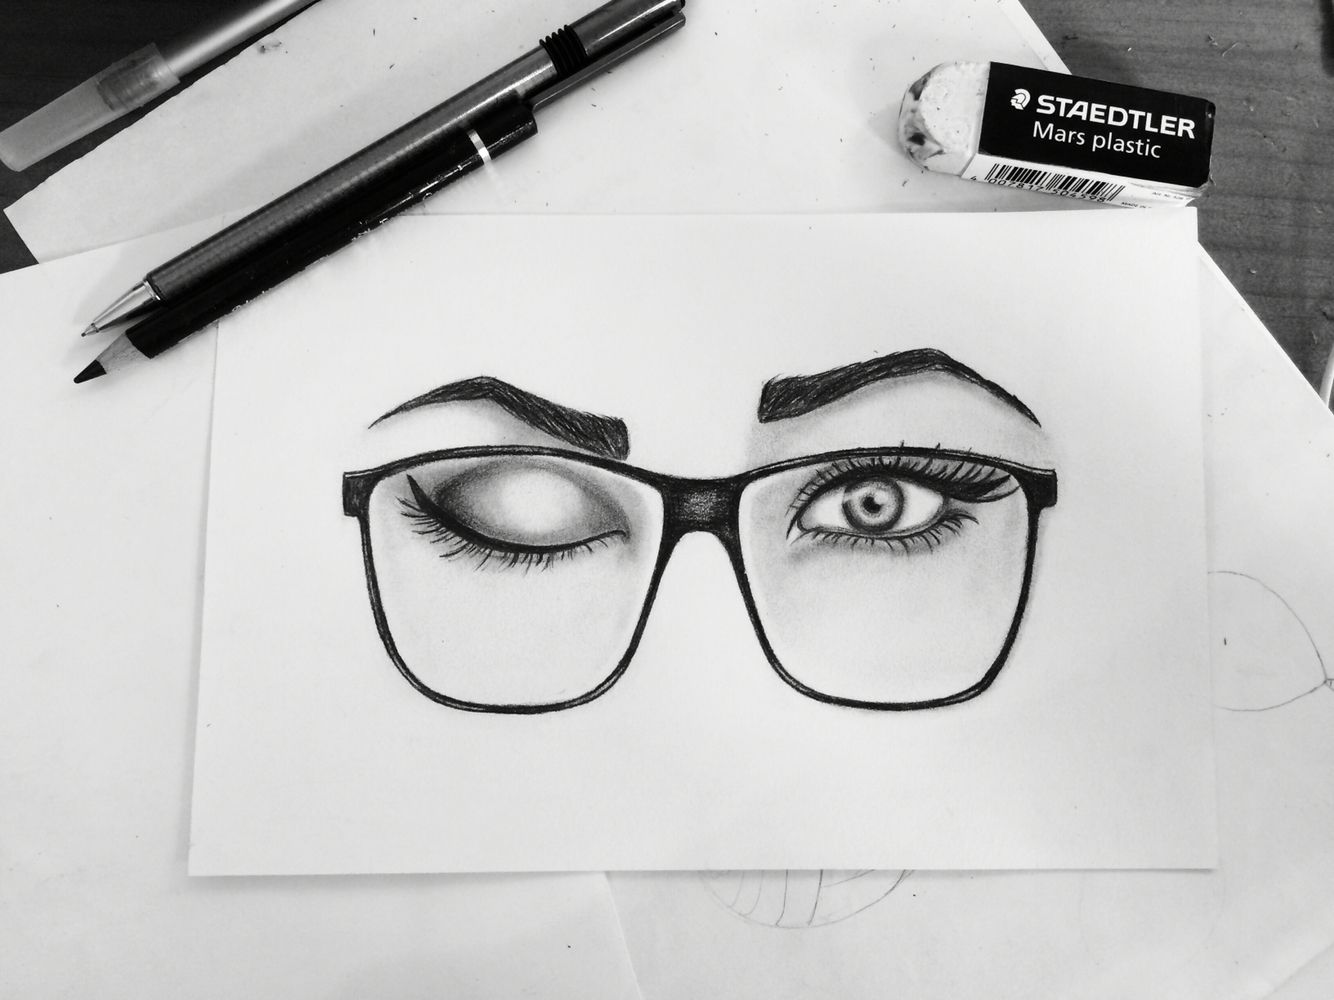 Eye-glasses. Top 10 Easiest Things to Draw